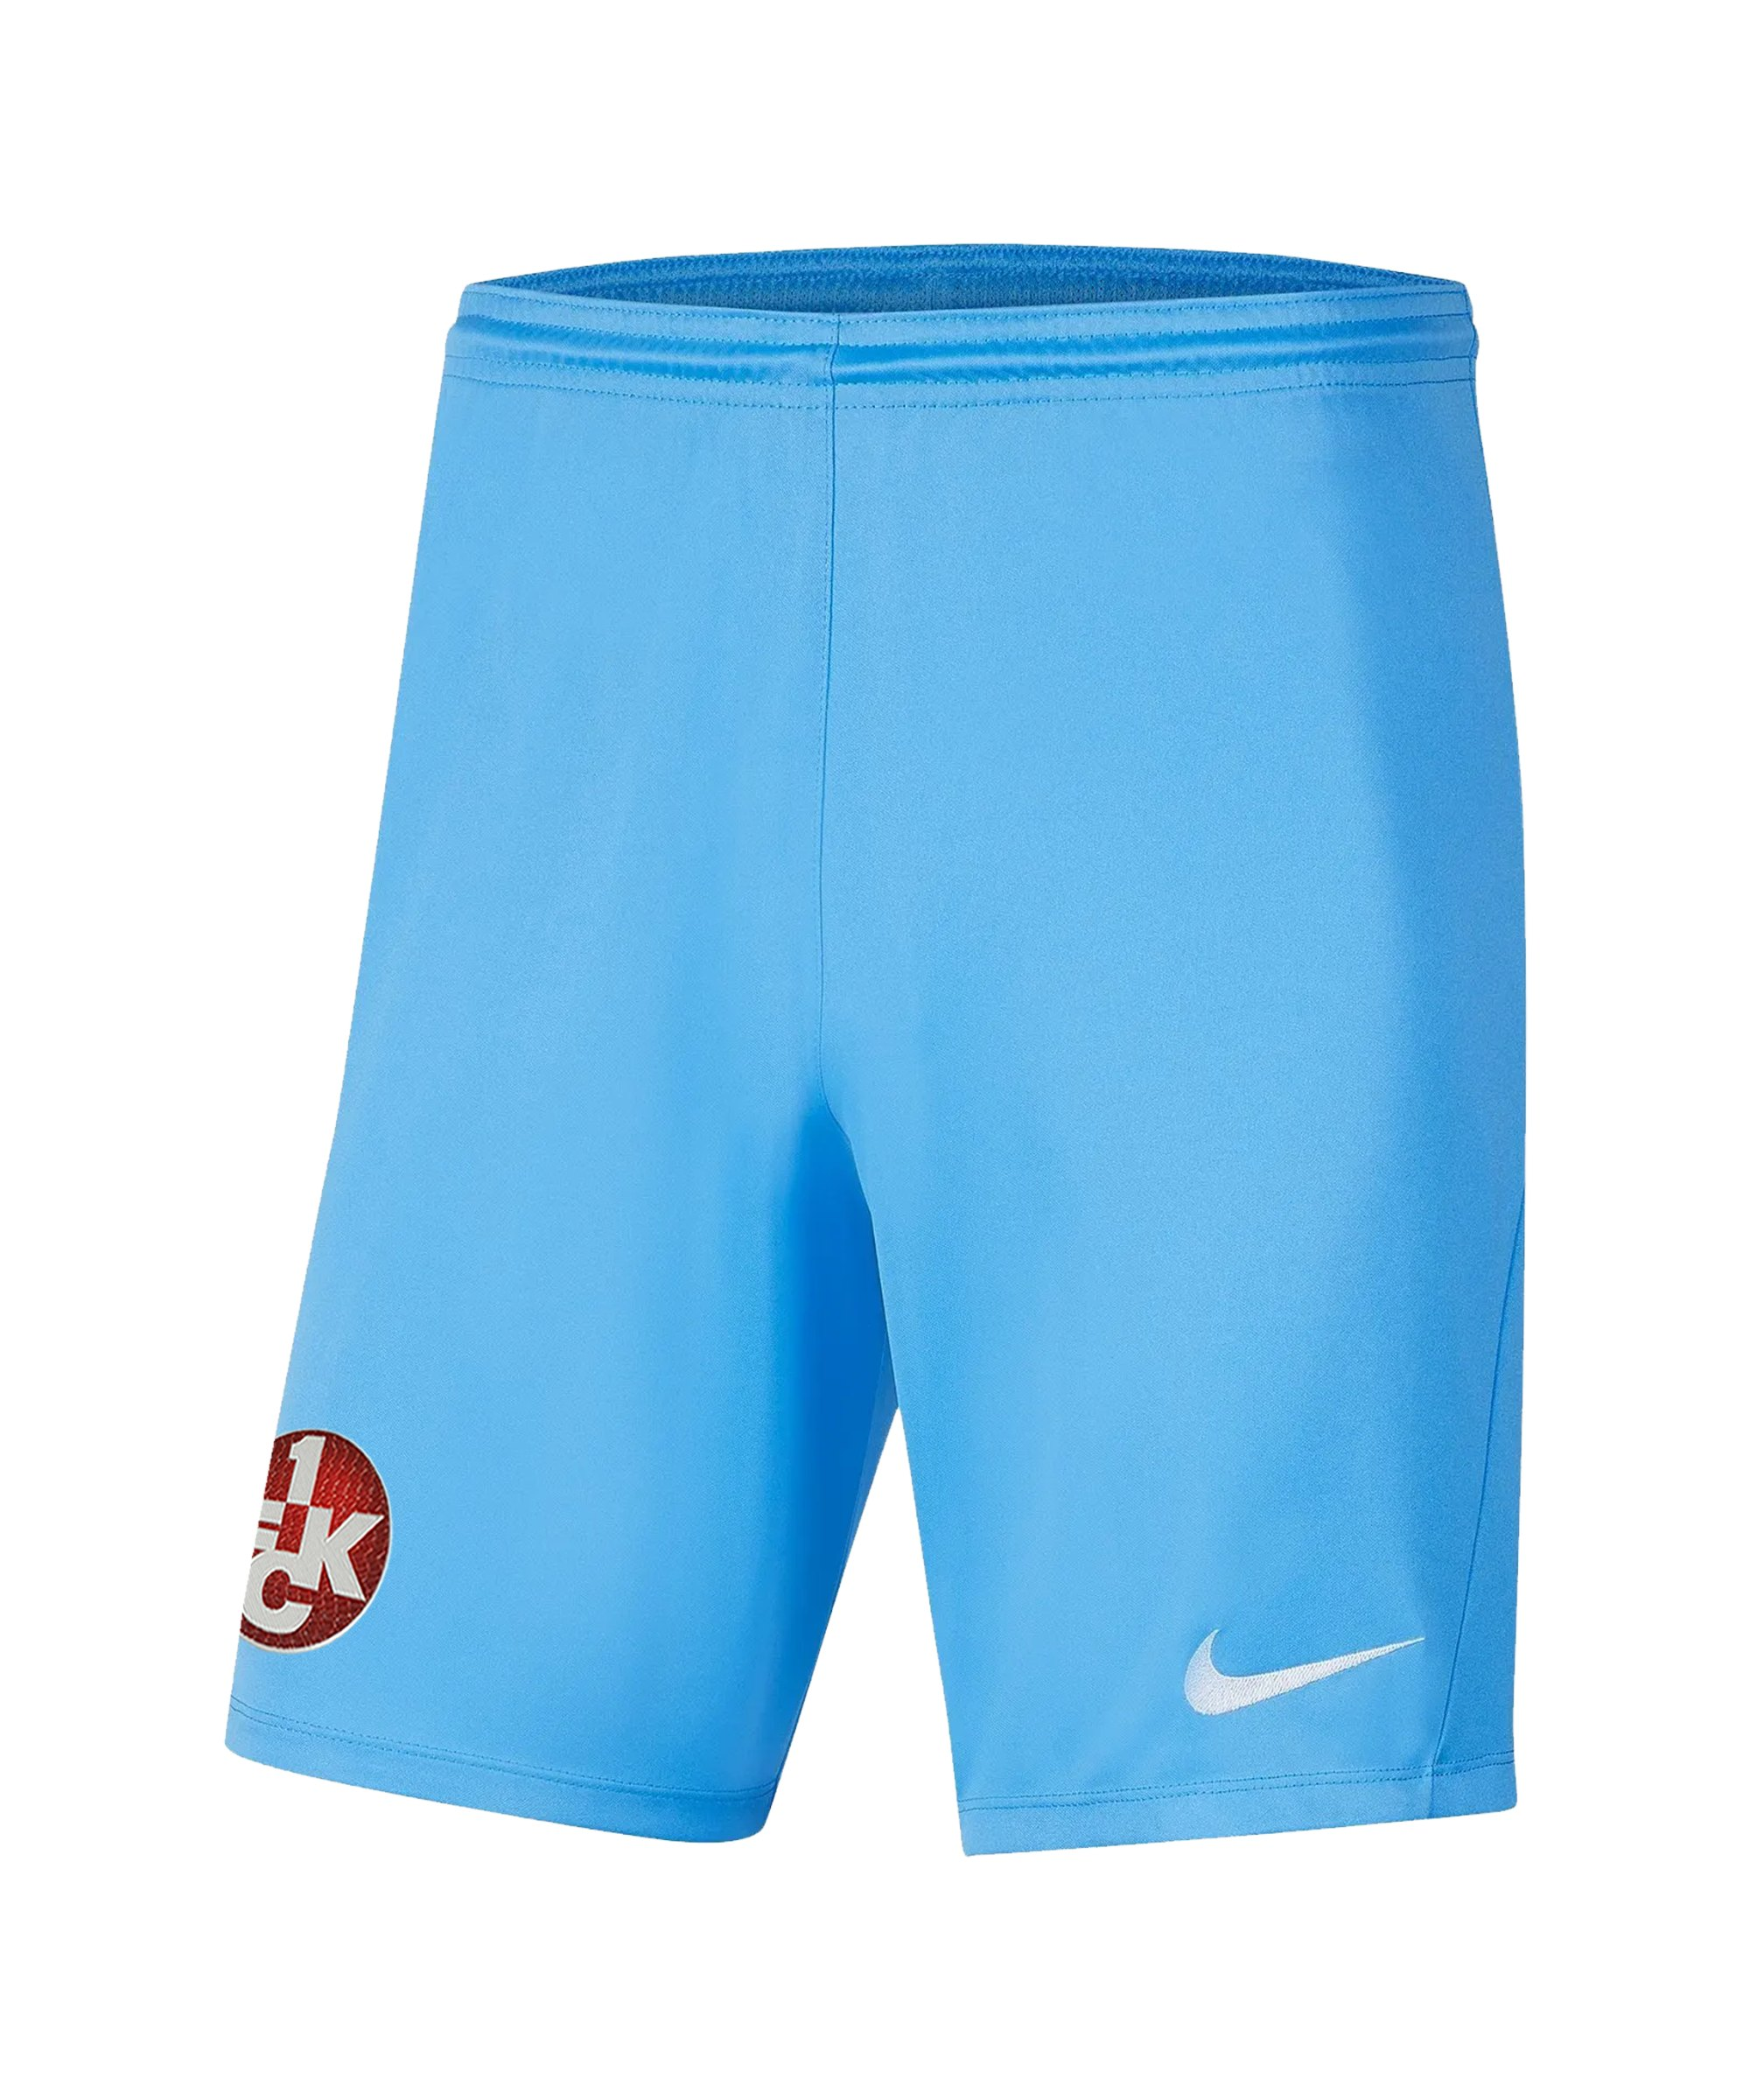 Nike 1. FC Kaiserslautern TW-Short 2021/2022 Kids F412 - blau